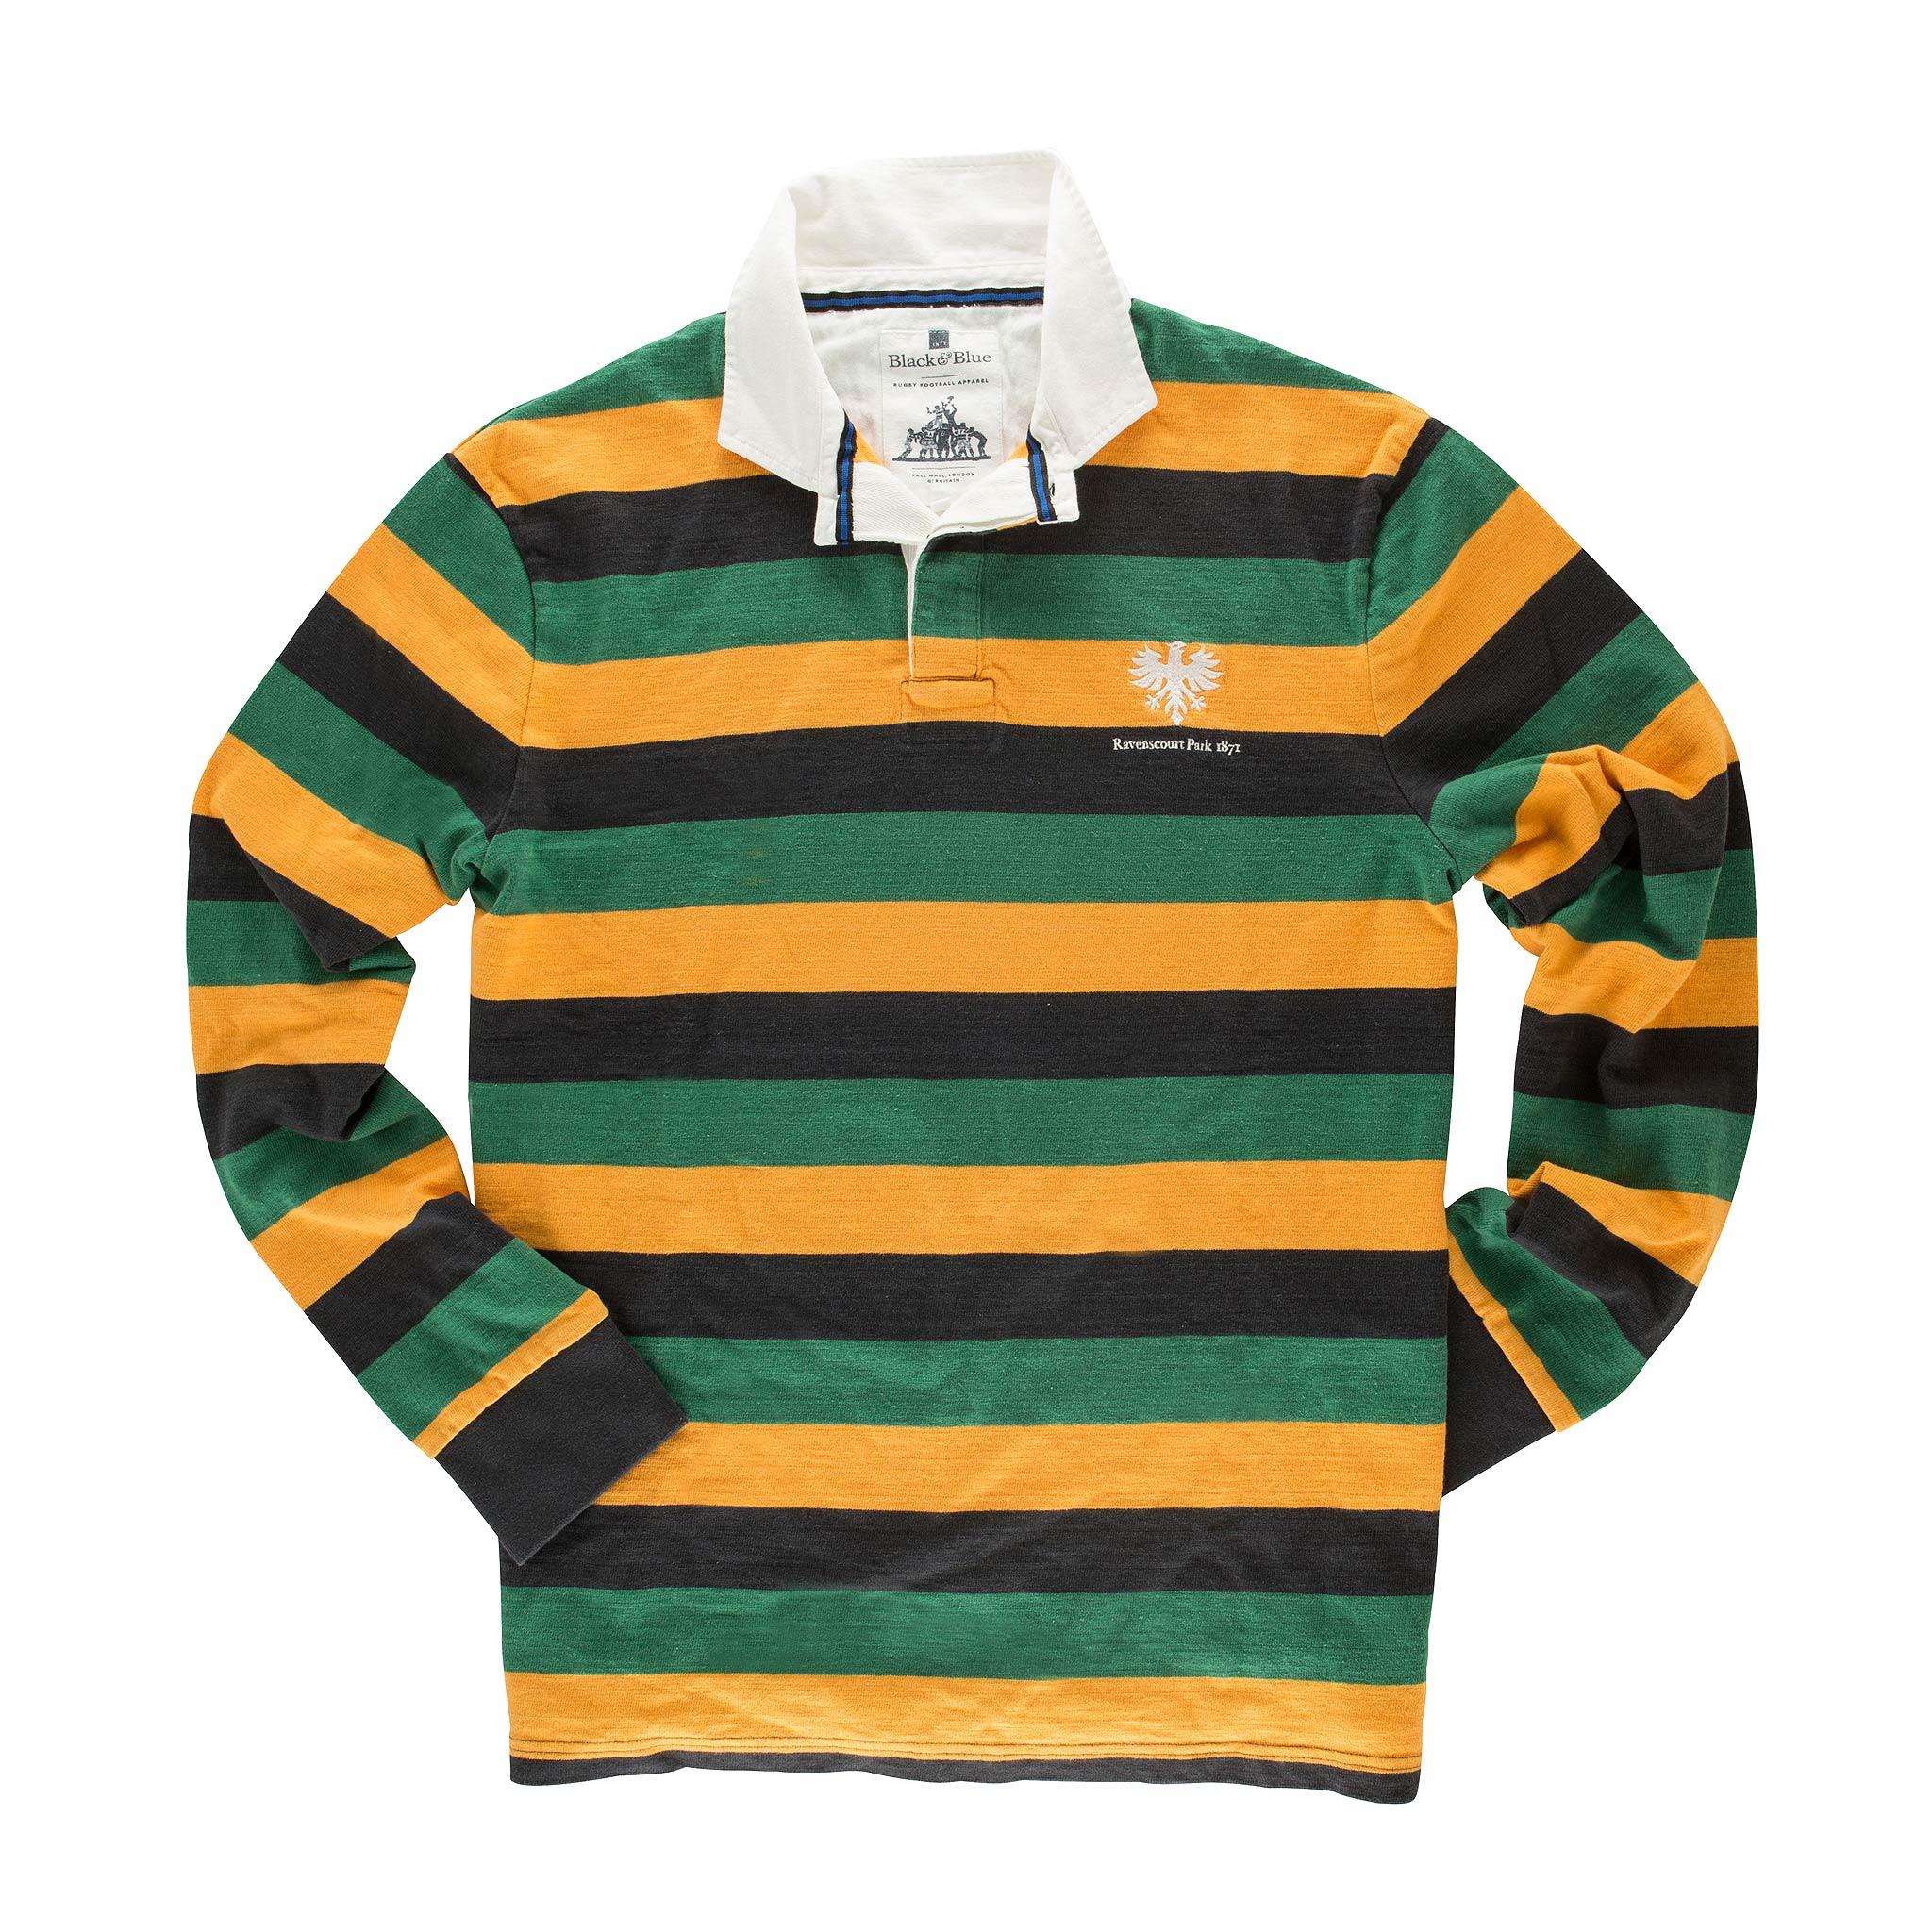 Ravenscourt Park 1871 Rugby Shirt - front